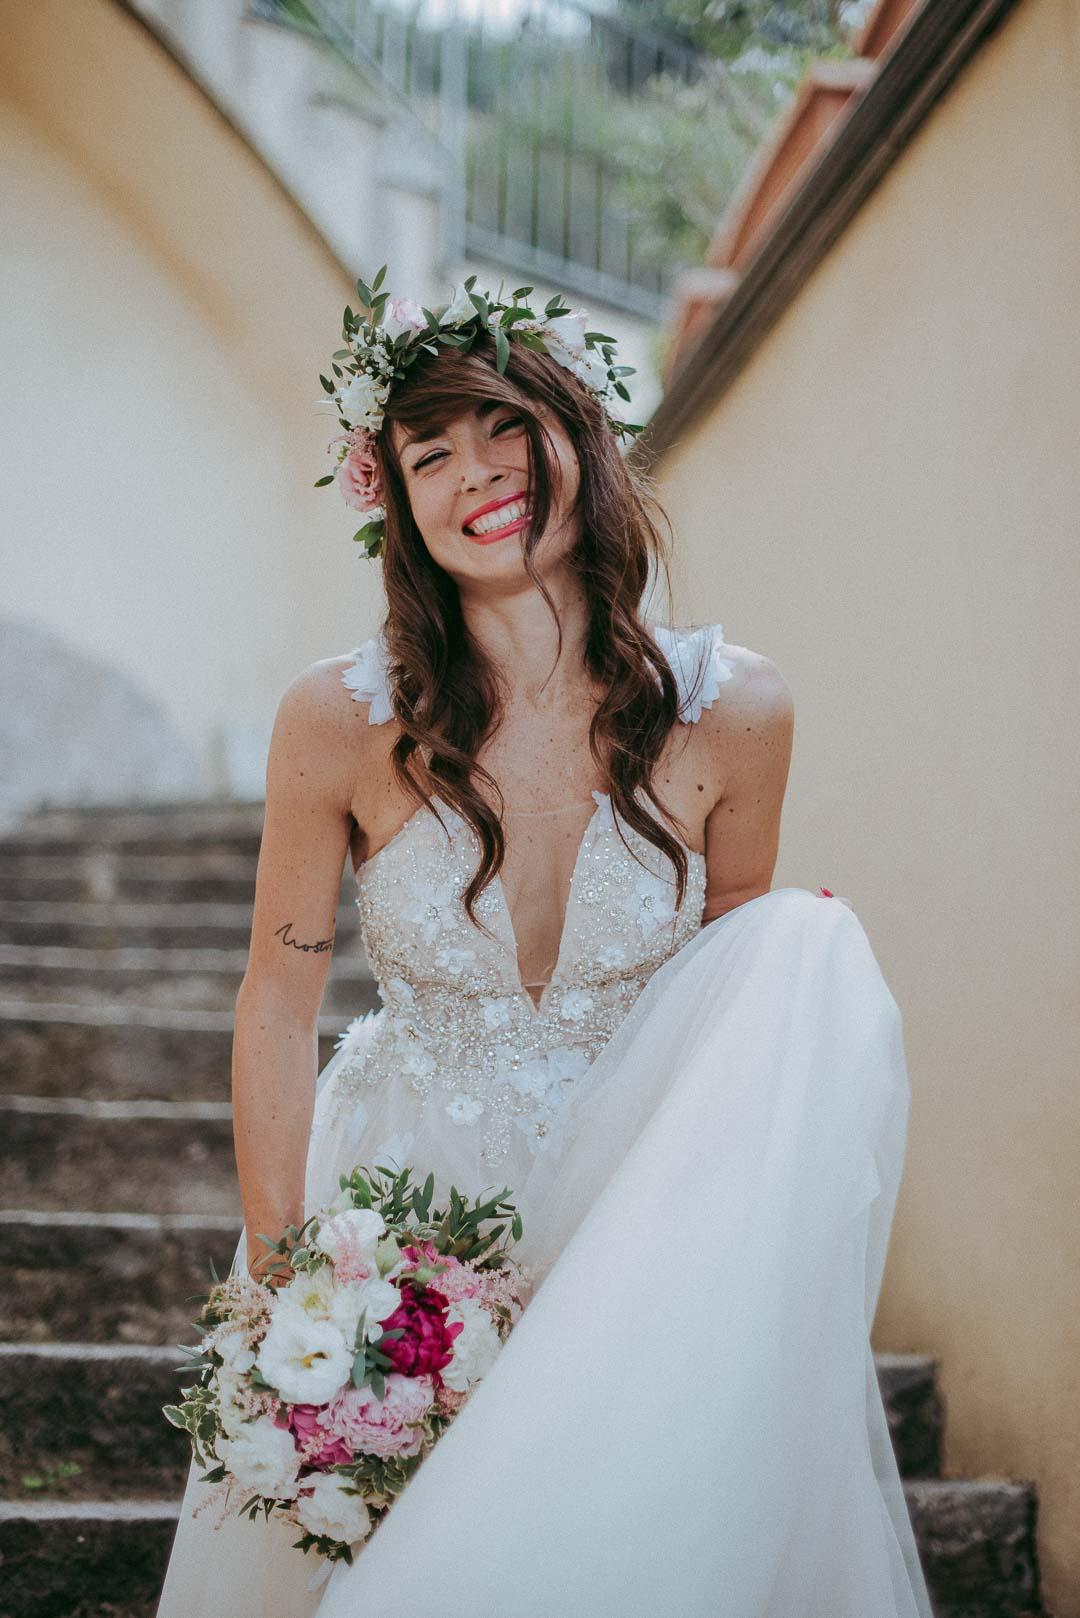 wedding-photographer-destination-fineart-bespoke-reportage-amalficoast-torrelacerniola-vivianeizzo-spazio46-53